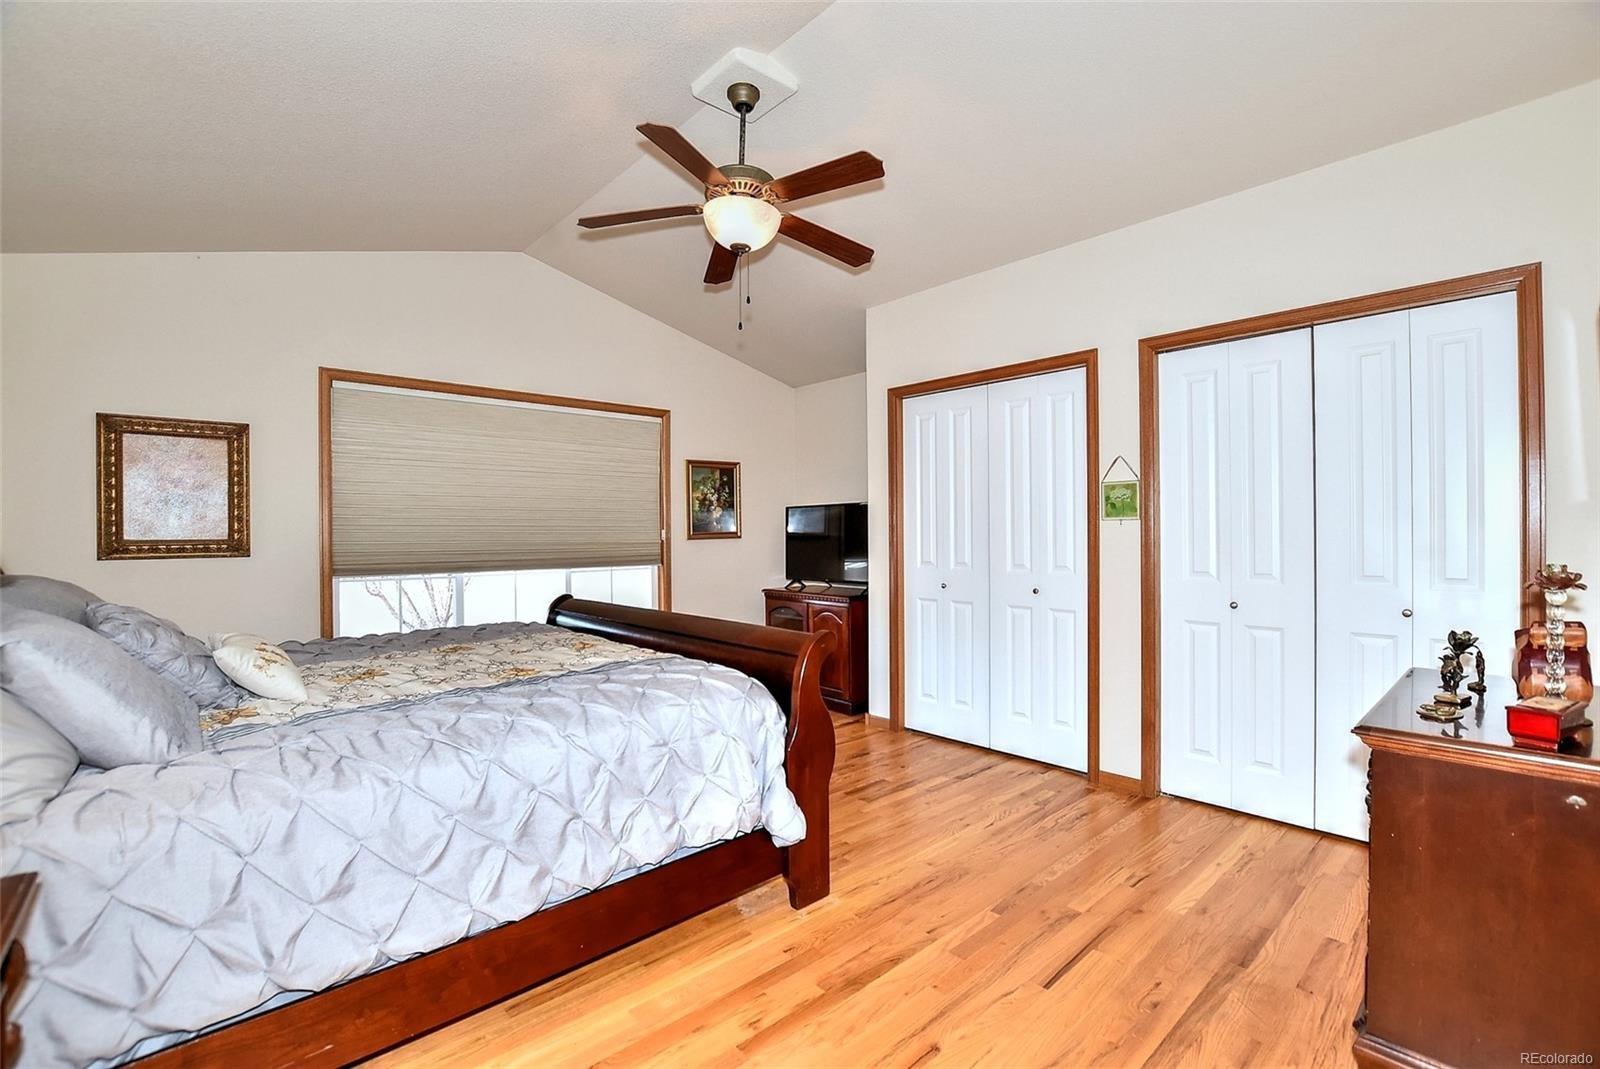 MLS# 8716122 - 17 - 2930 Culebra Peak Drive, Loveland, CO 80538